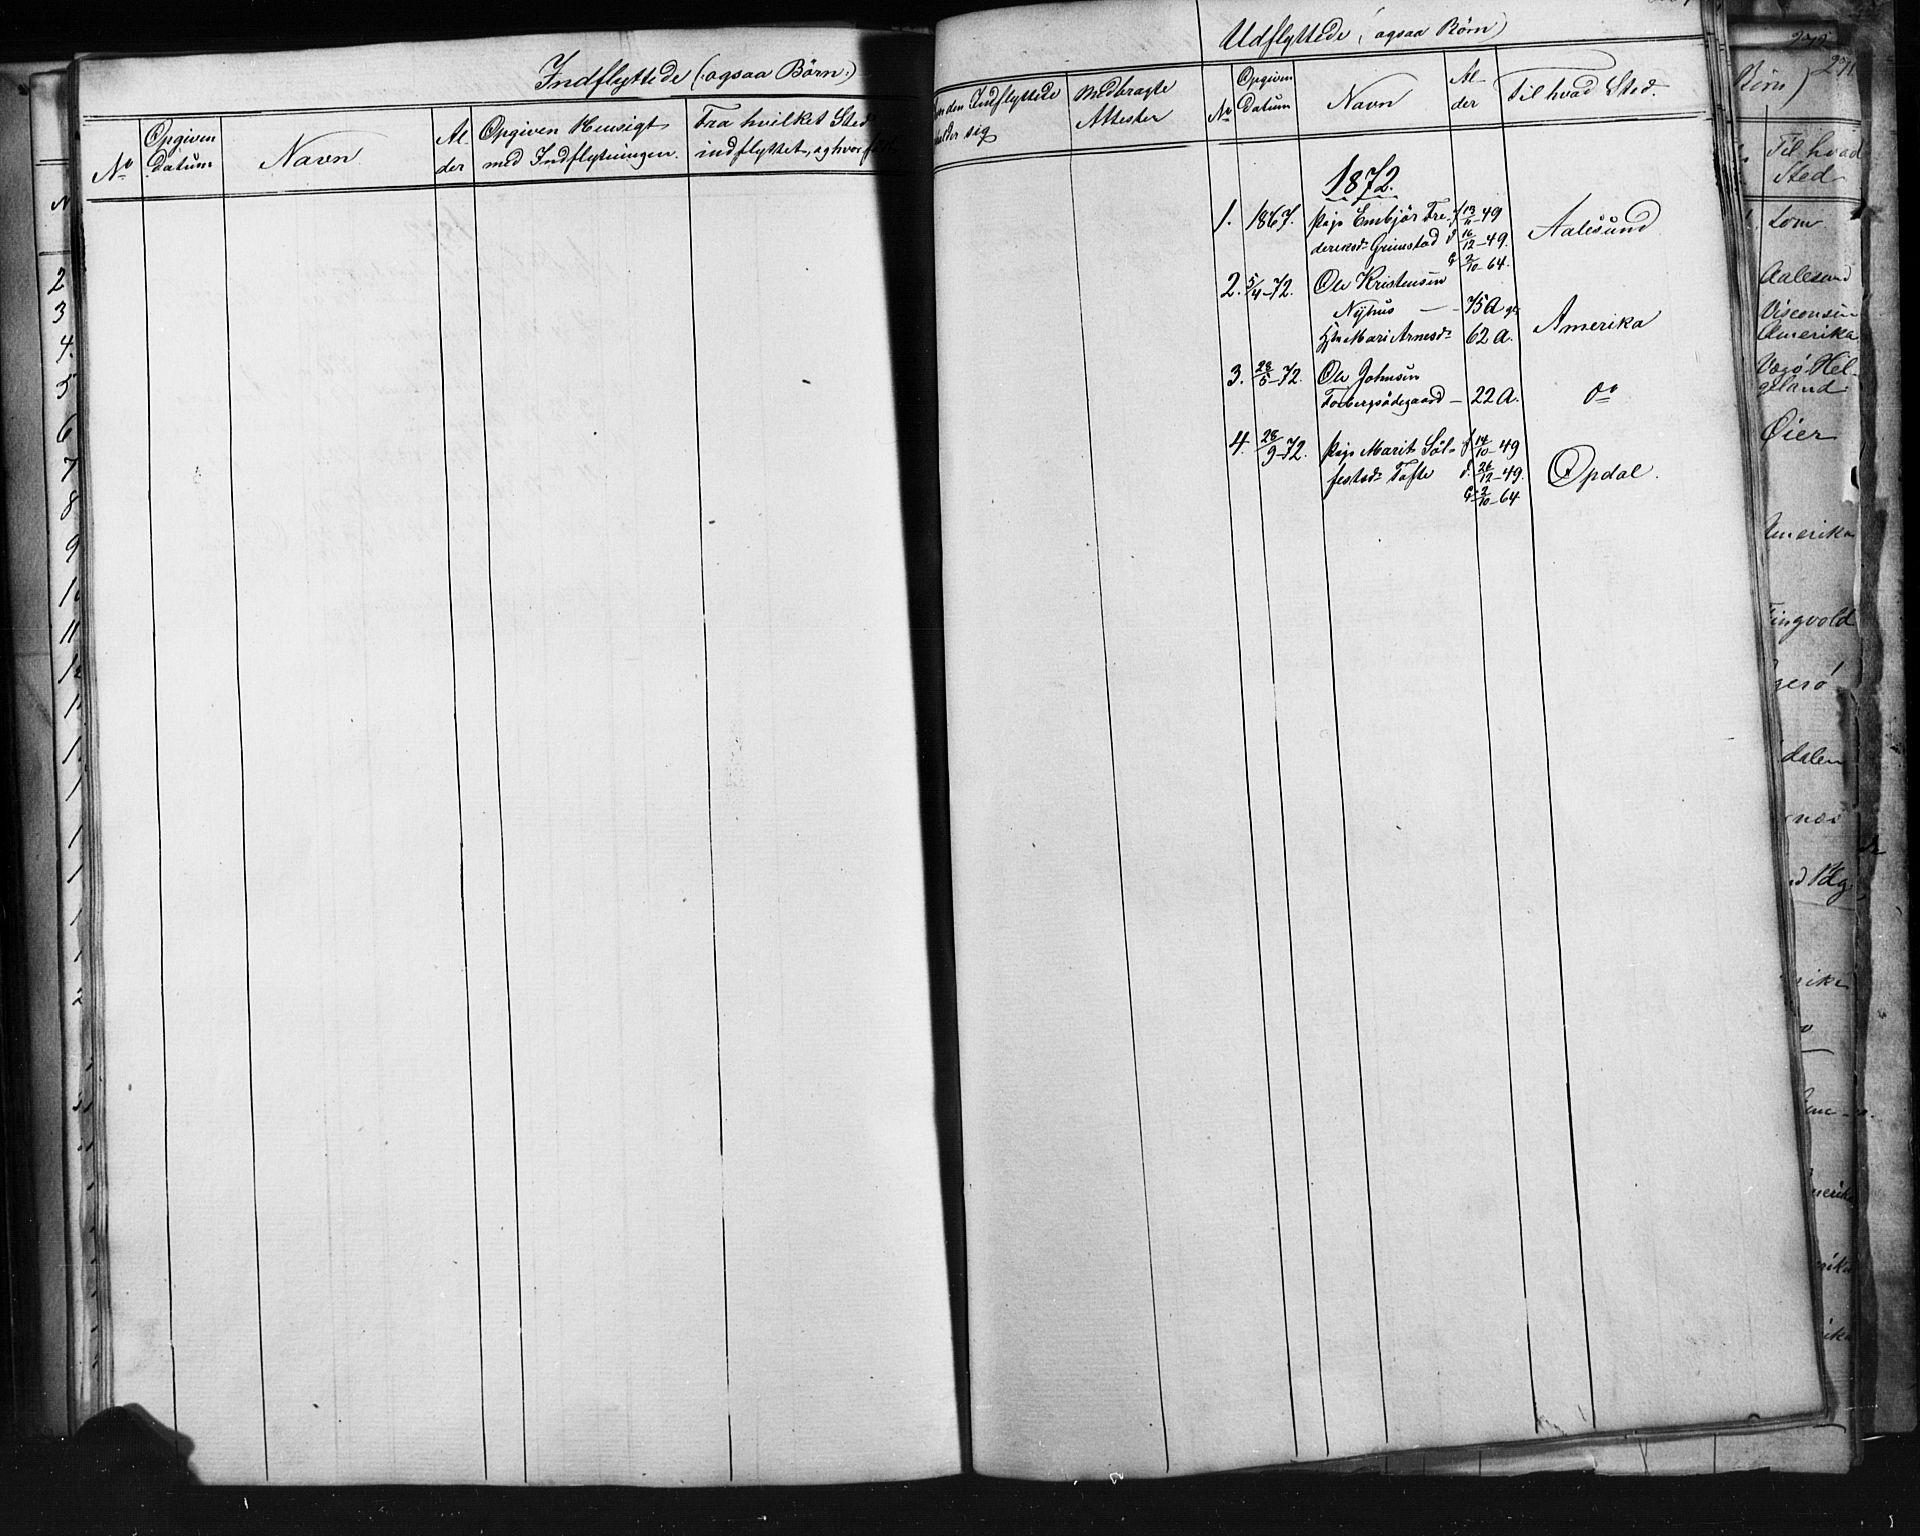 SAH, Skjåk prestekontor, Klokkerbok nr. 1, 1865-1893, s. 264